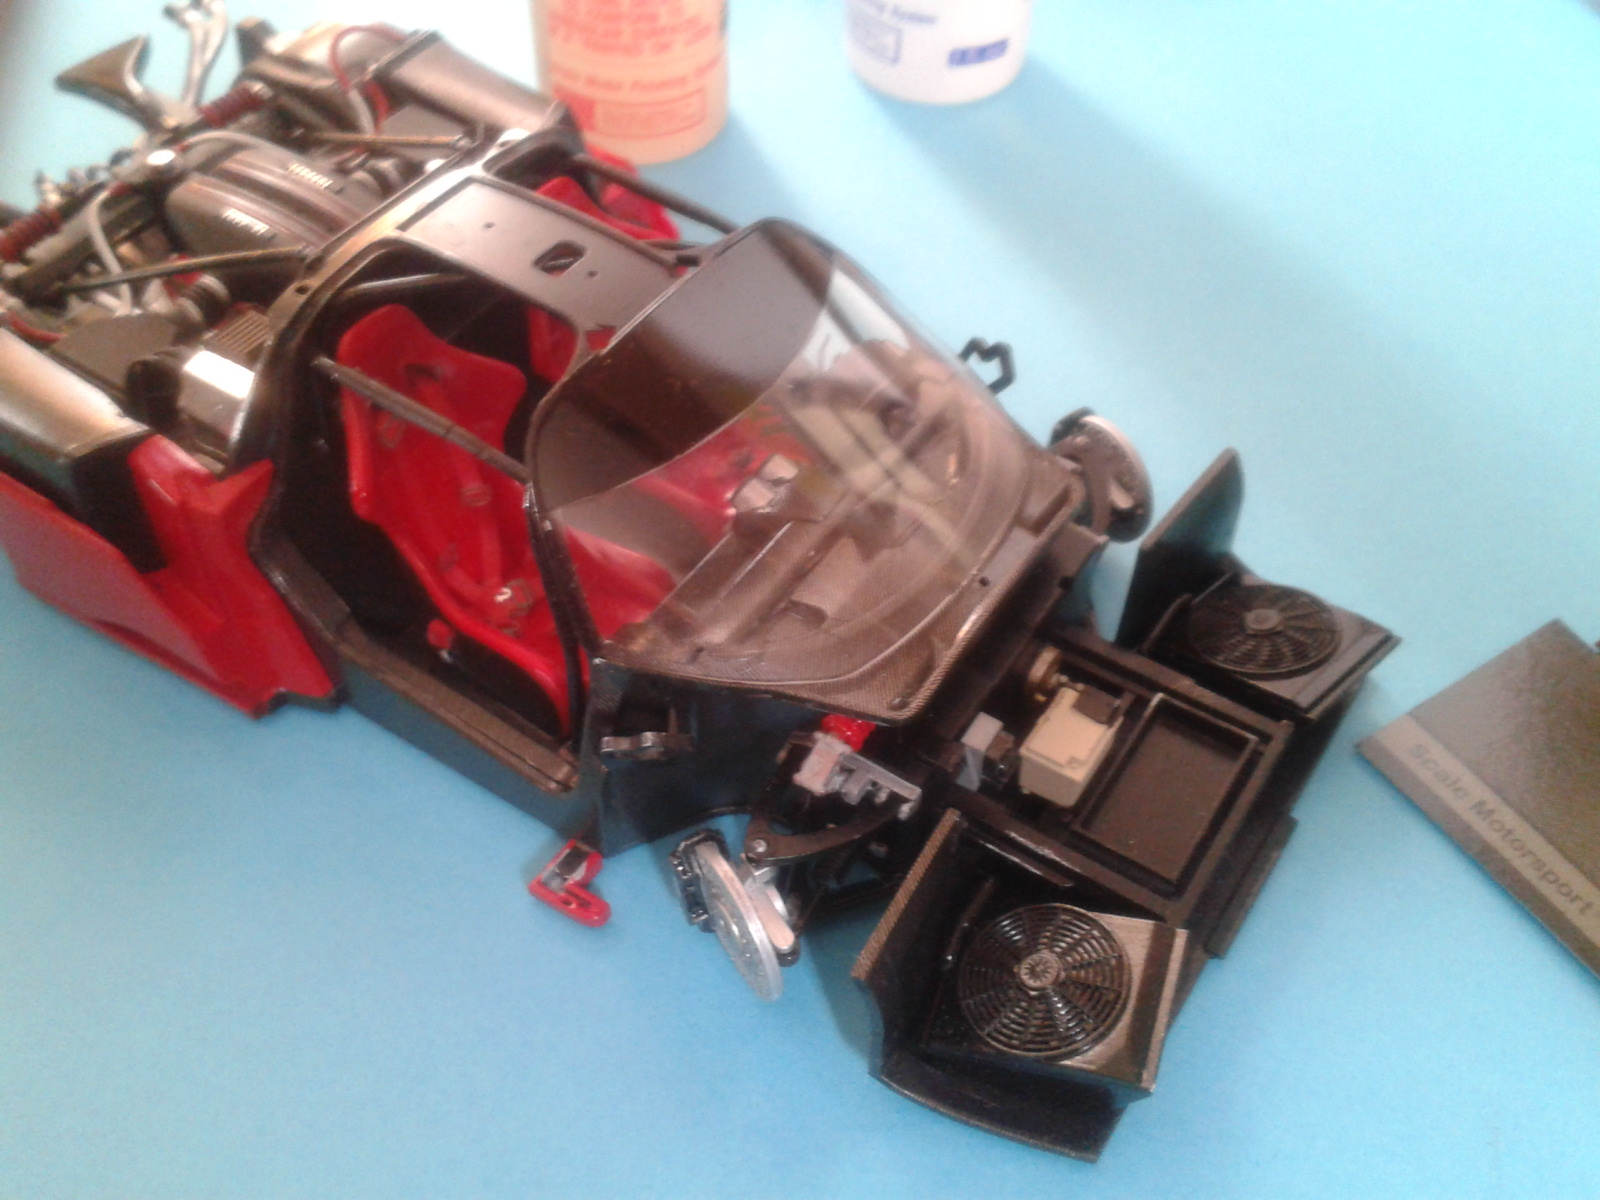 Ferrari FXX ...Tamiya 1/24... Reprise du montage !!!!!! 20130403183721